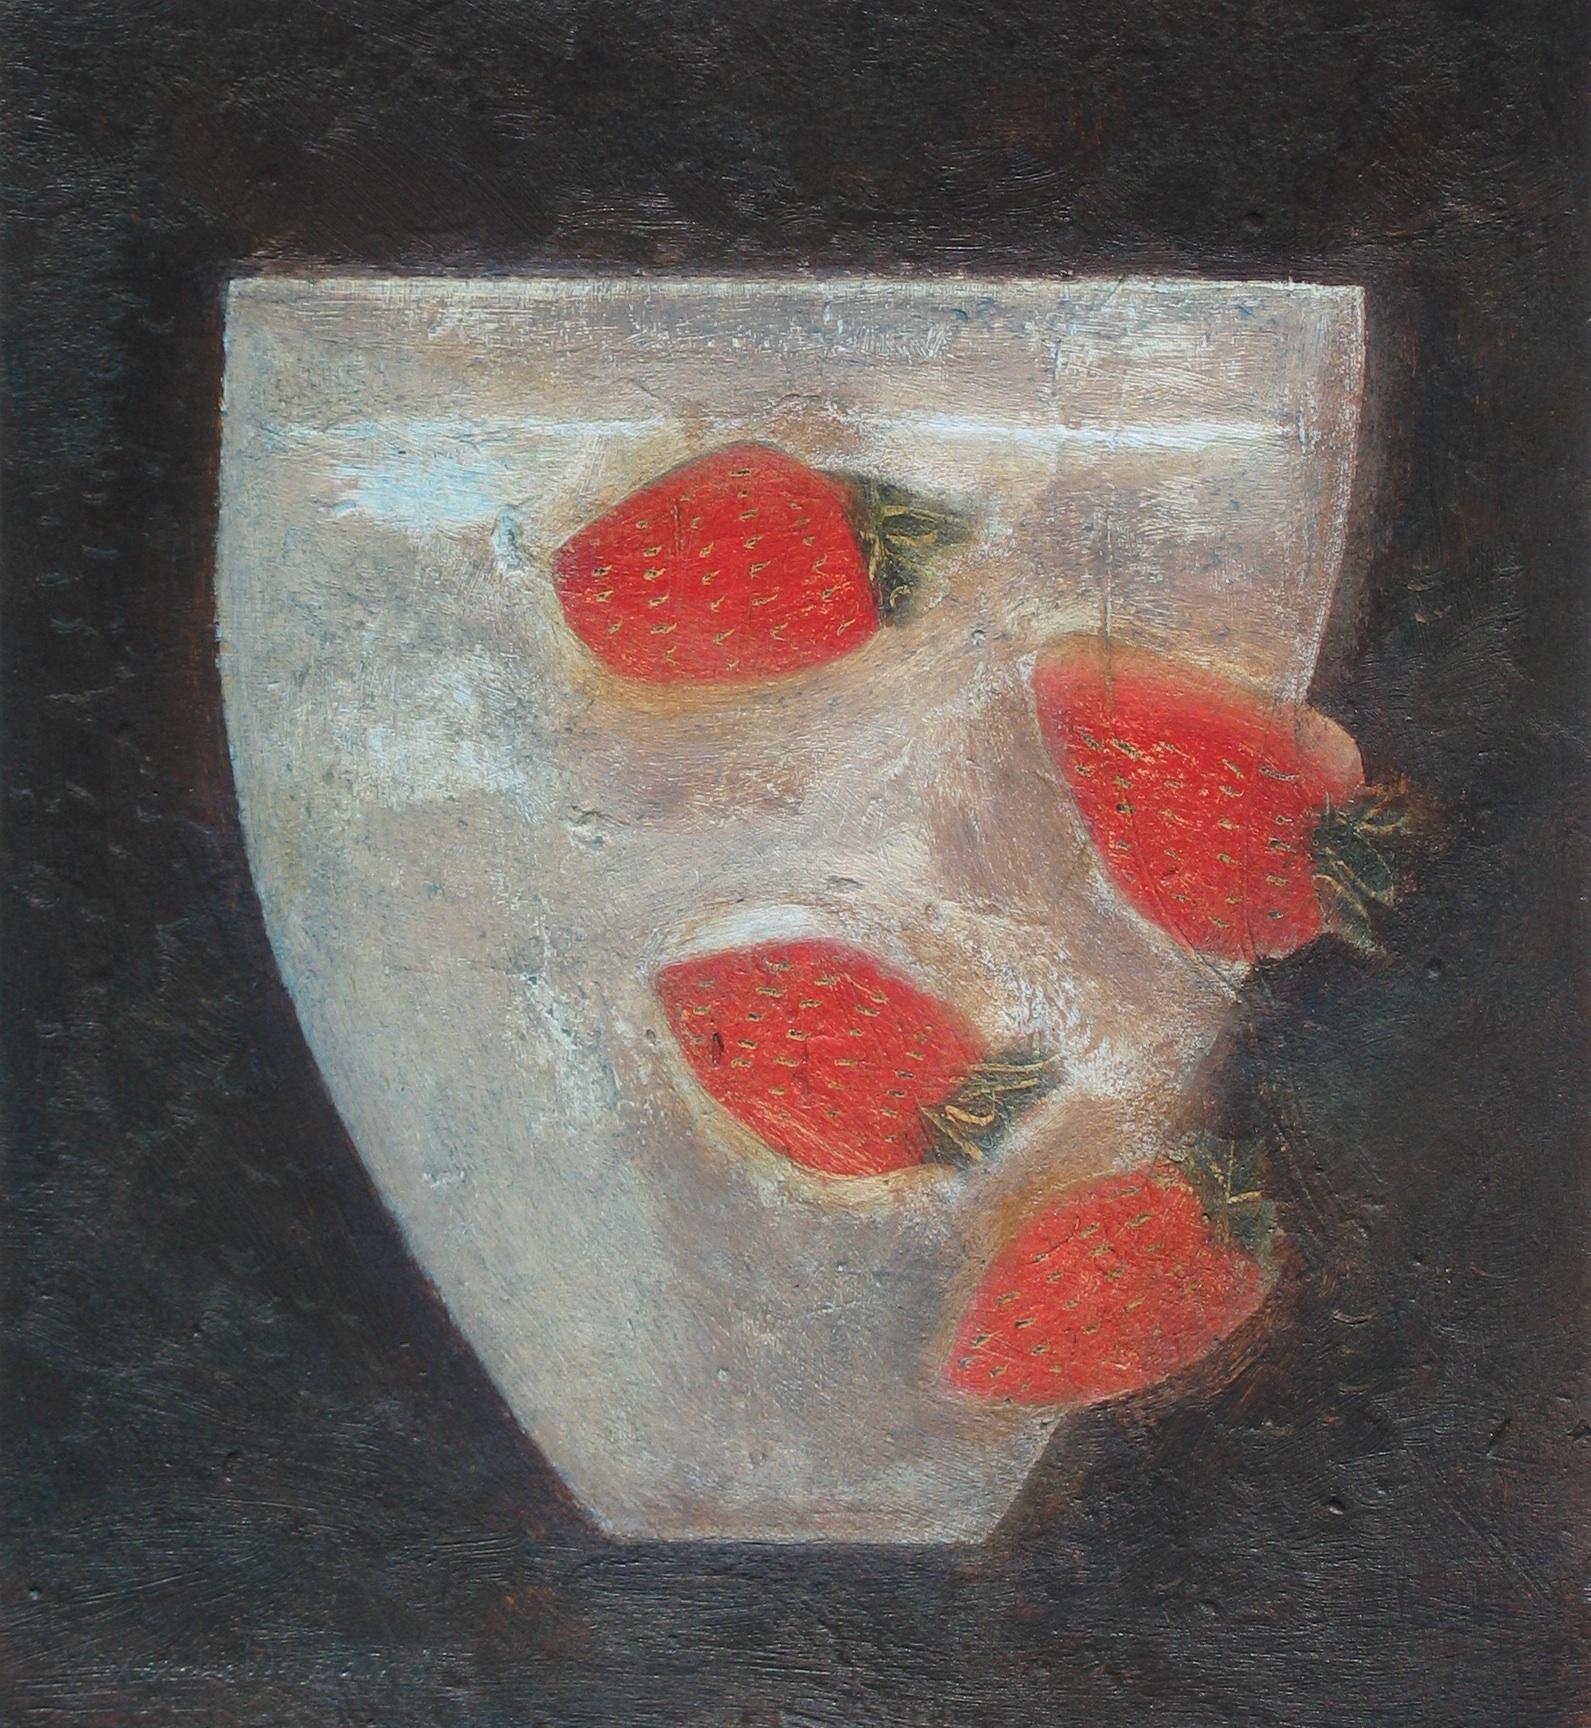 Strawberry Bowl, 24cm x 24cm, 2014